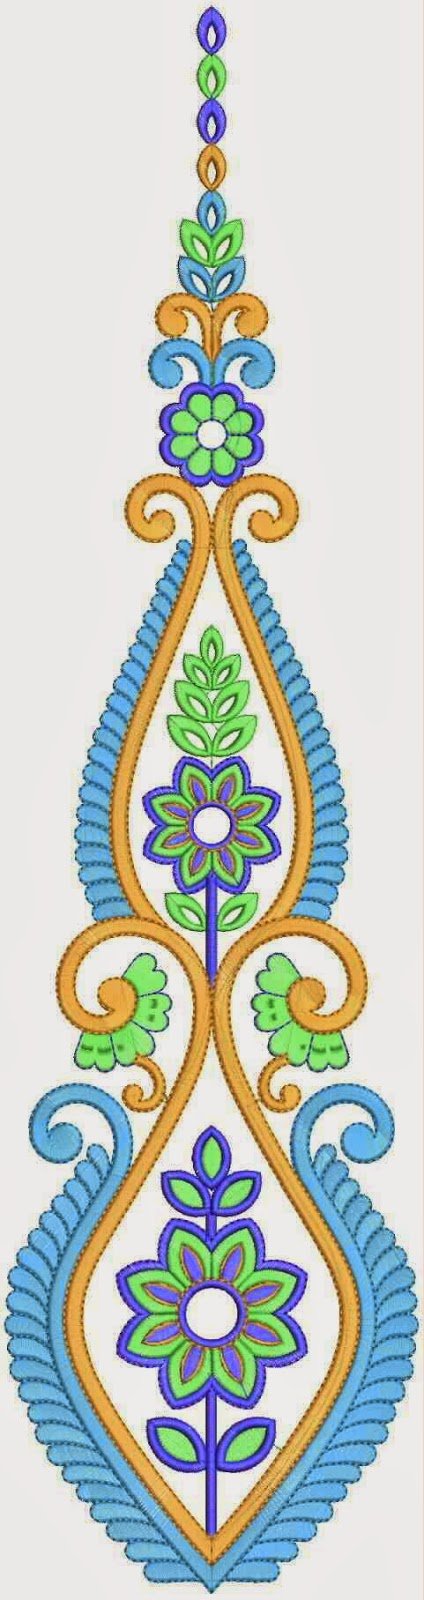 kulturele blomme borduurwerk quilt patroon